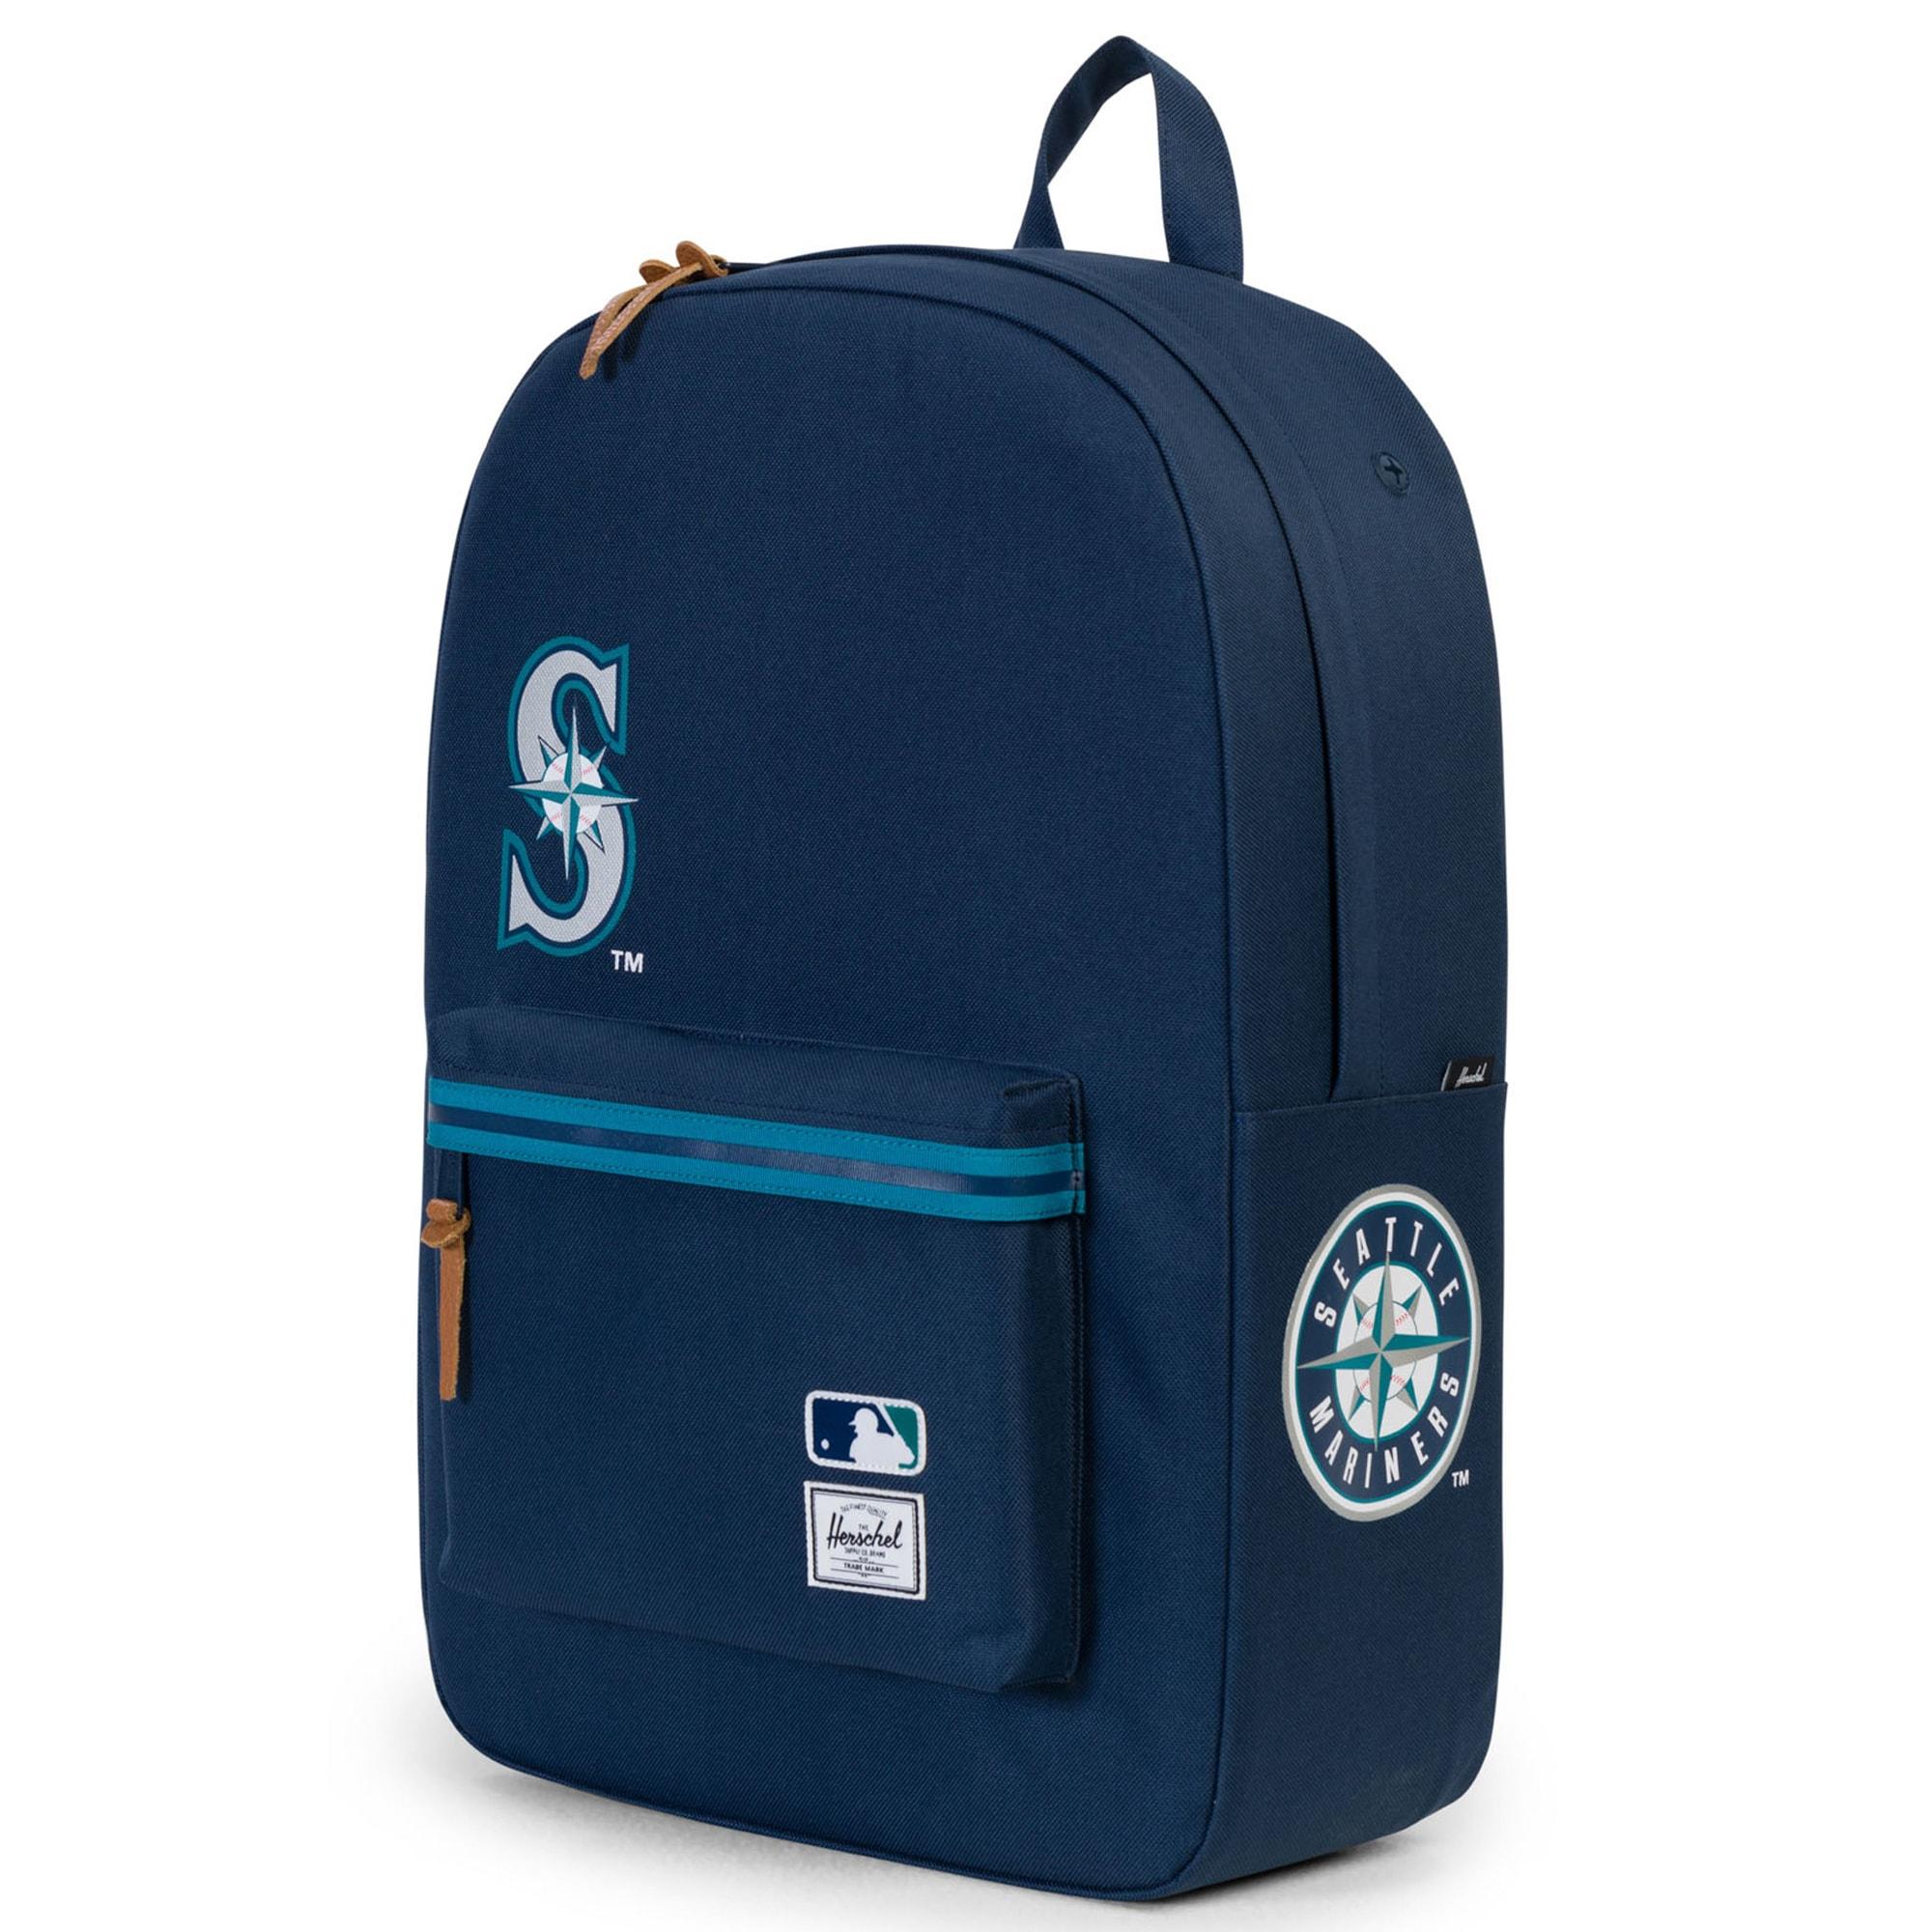 Seattle Mariners Herschel Supply Co. Heritage Backpack